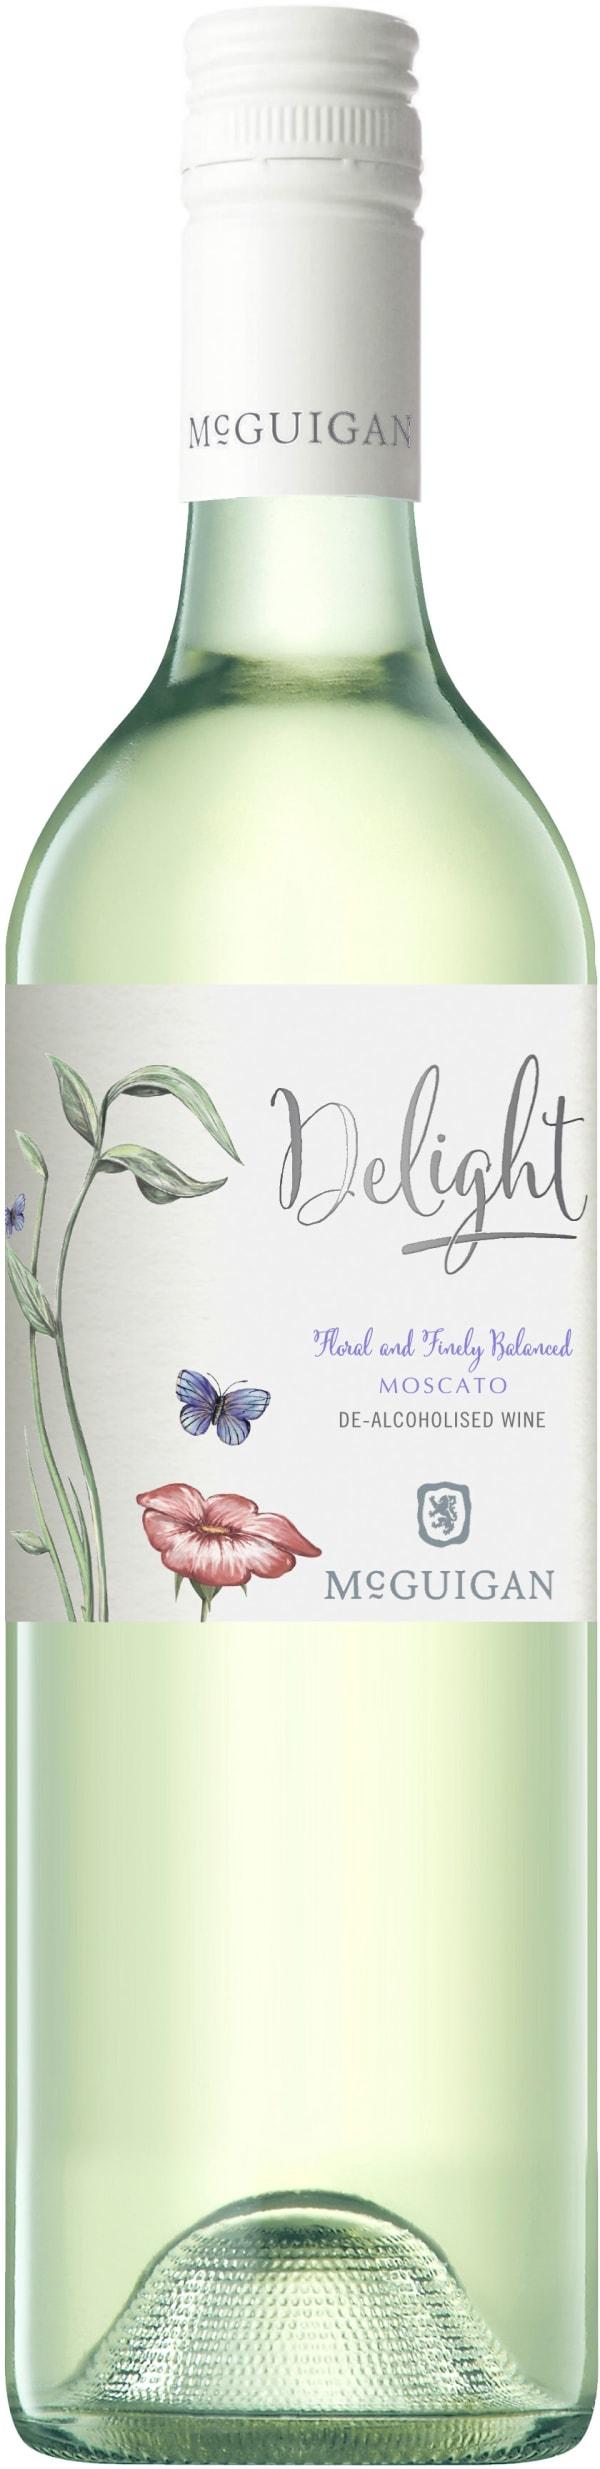 McGuigan Delight Moscato Alcohol free